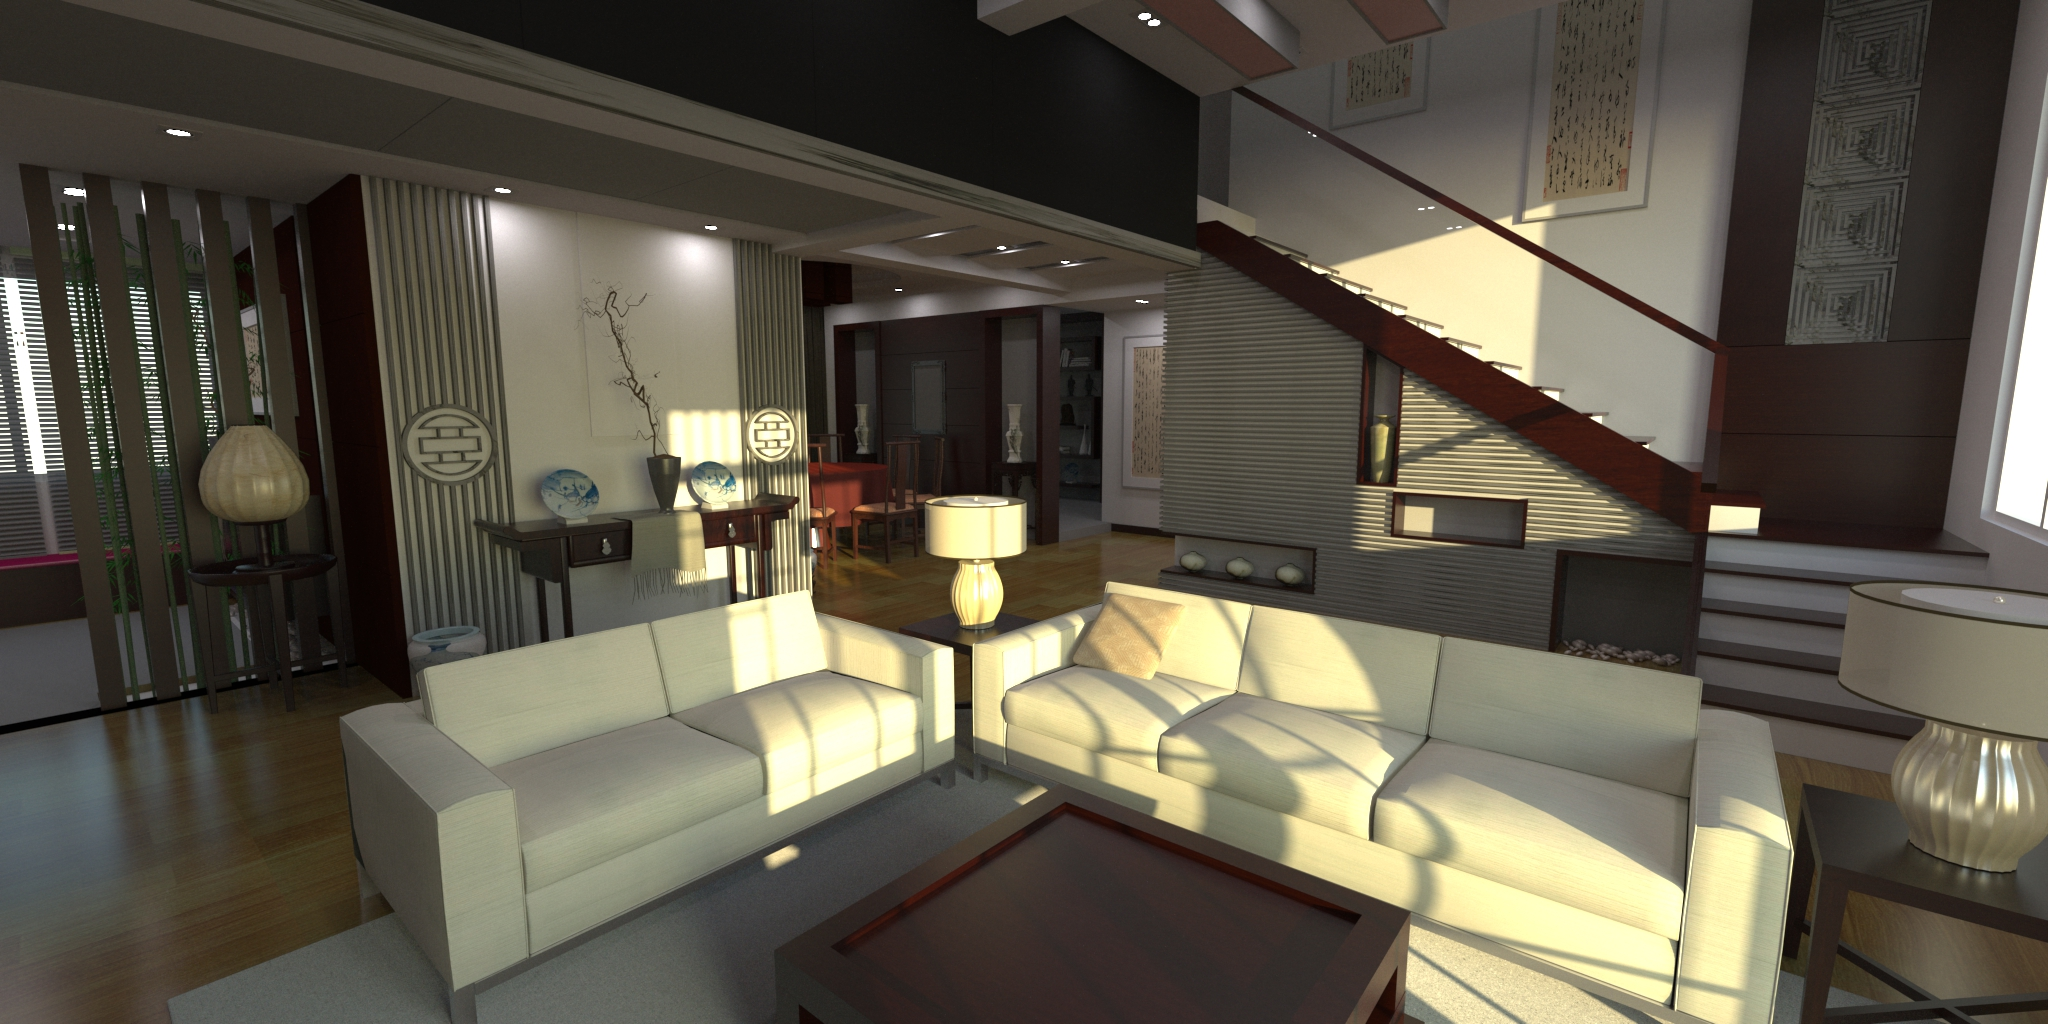 penthouse interior design experts architecture kitchen architectural rendering luxury